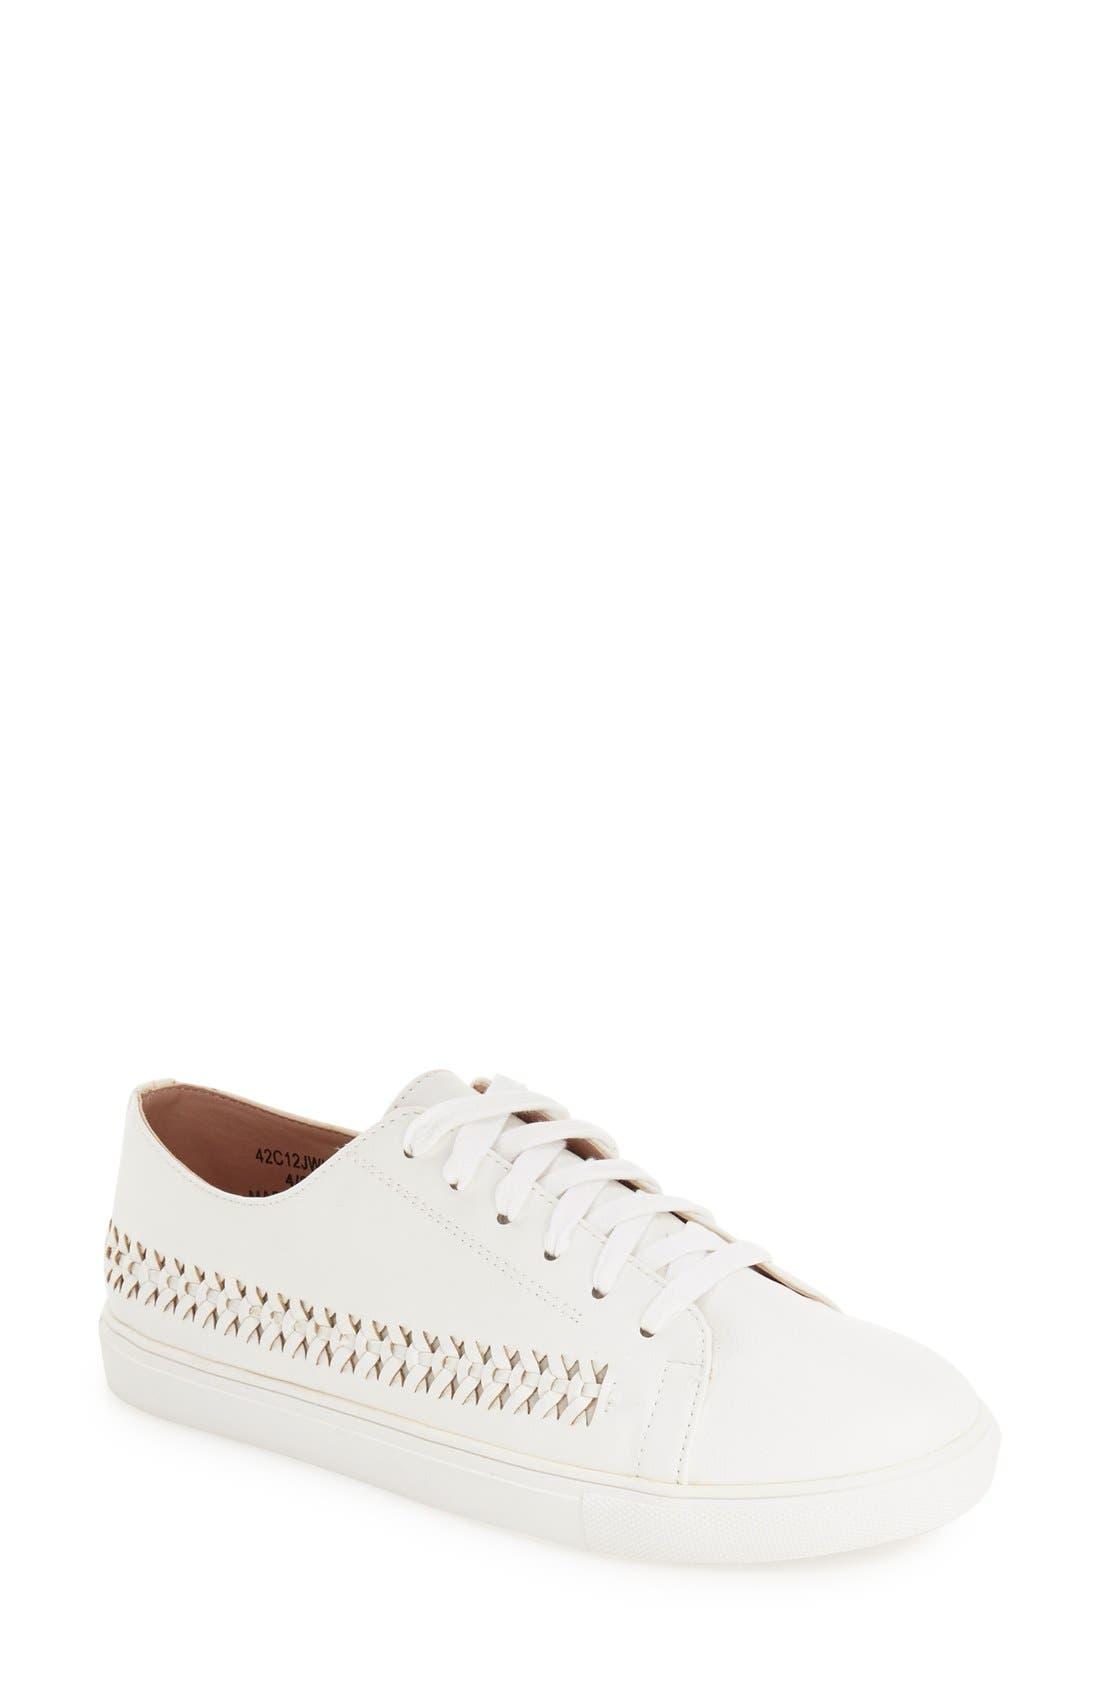 Alternate Image 1 Selected - Topshop 'Conner Plait' Sneaker (Women)